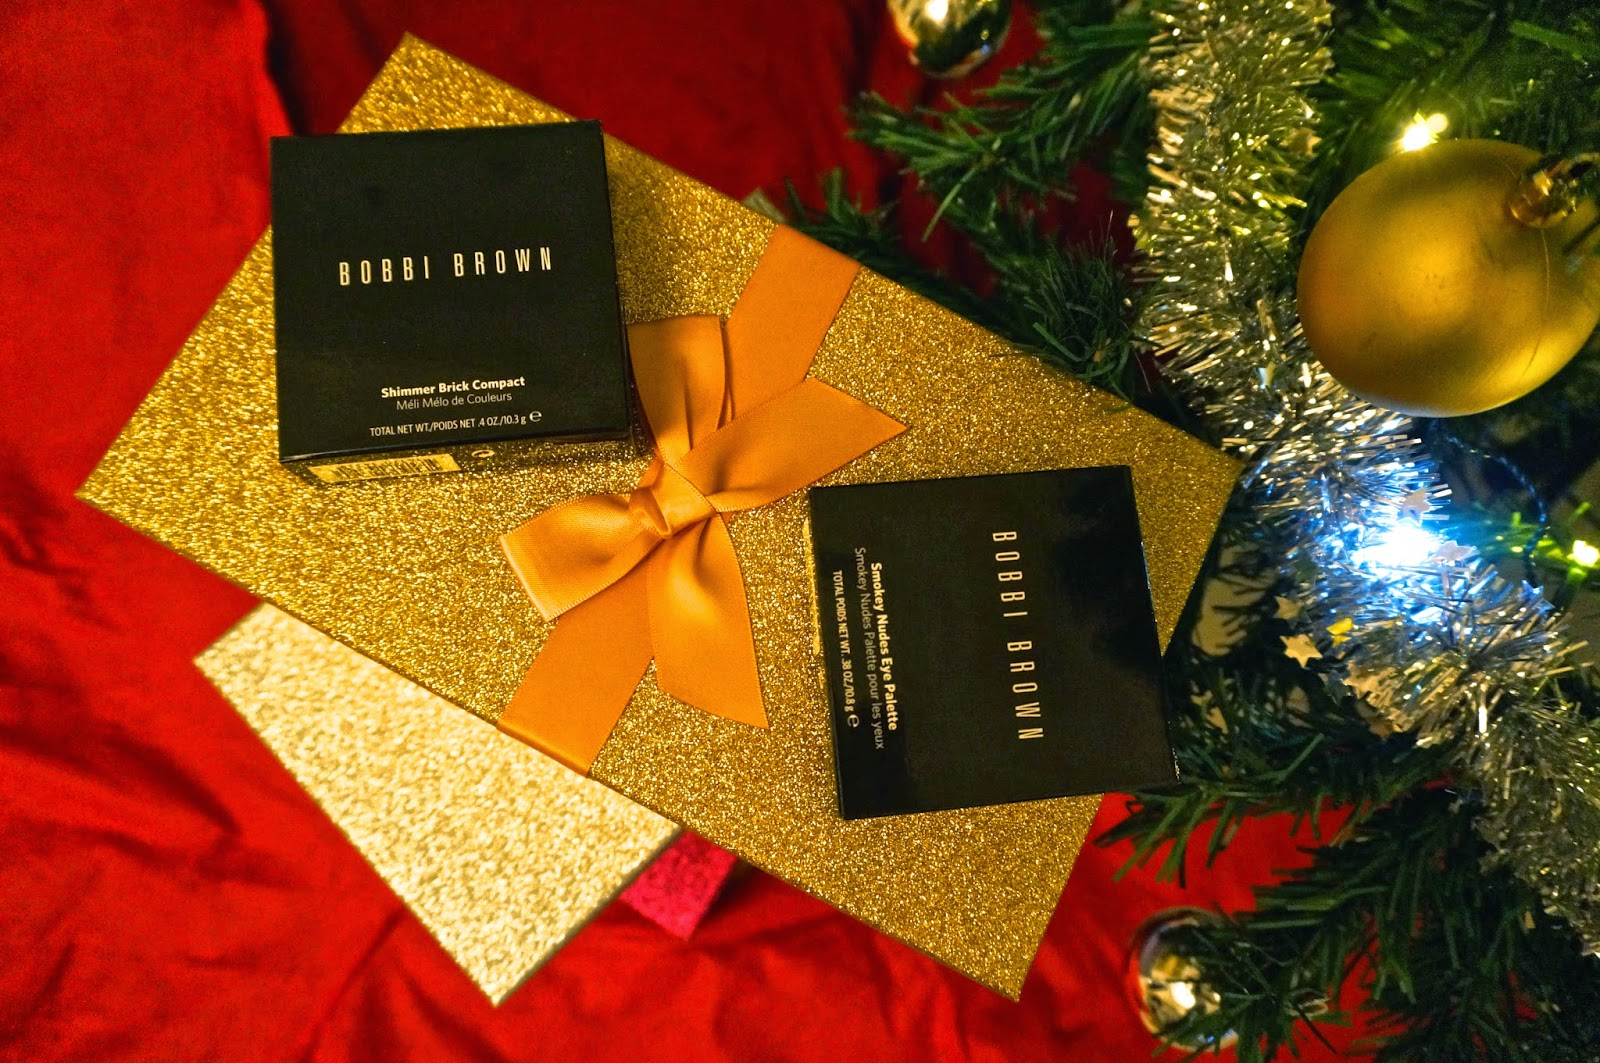 Christmas stocking fillers: Bobbi Brown